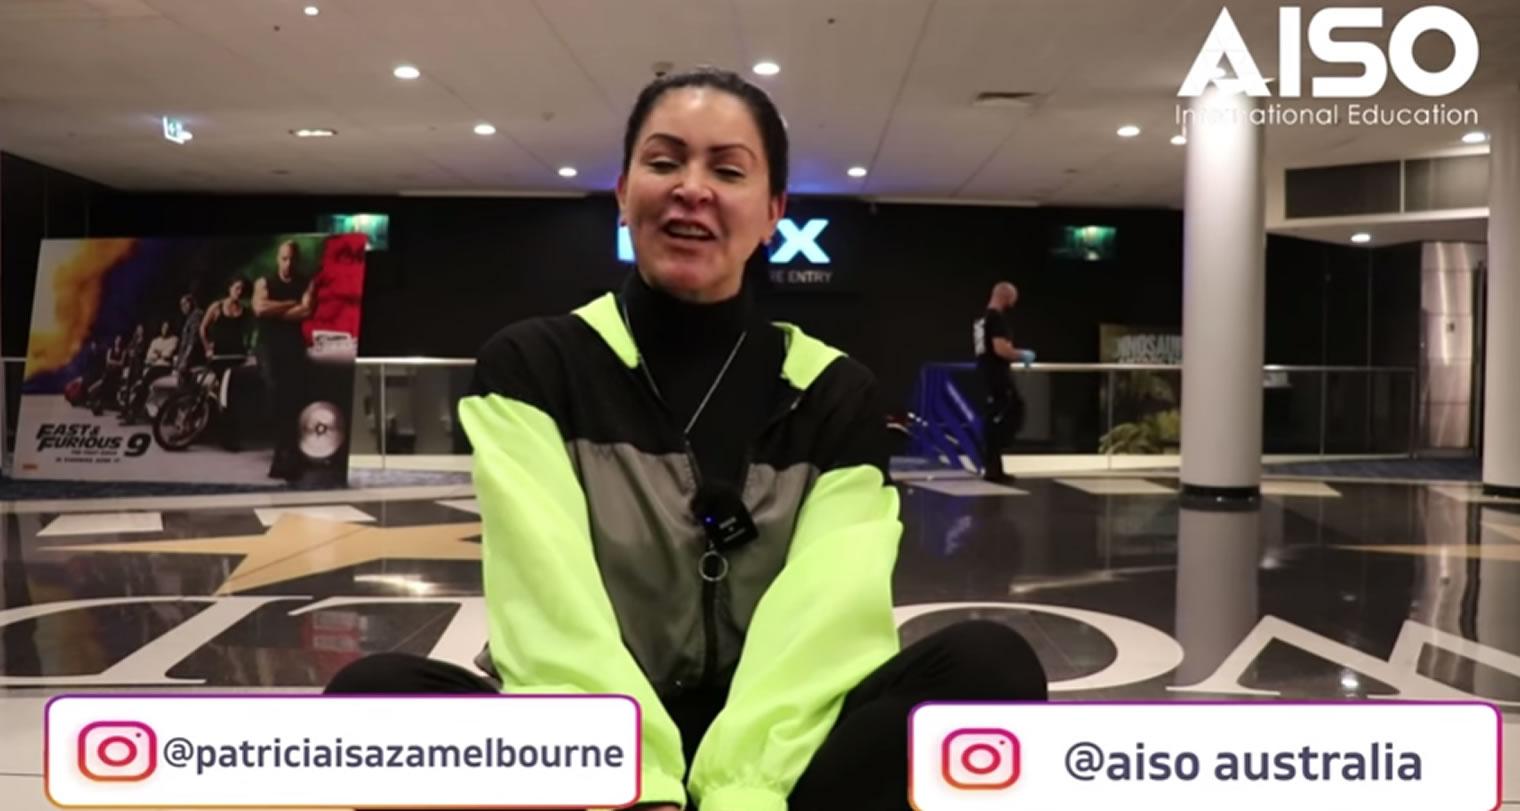 Noticias de Australia, sobre planes pilotos - Aussie News para Latinos - Estudiar en Australia 2022